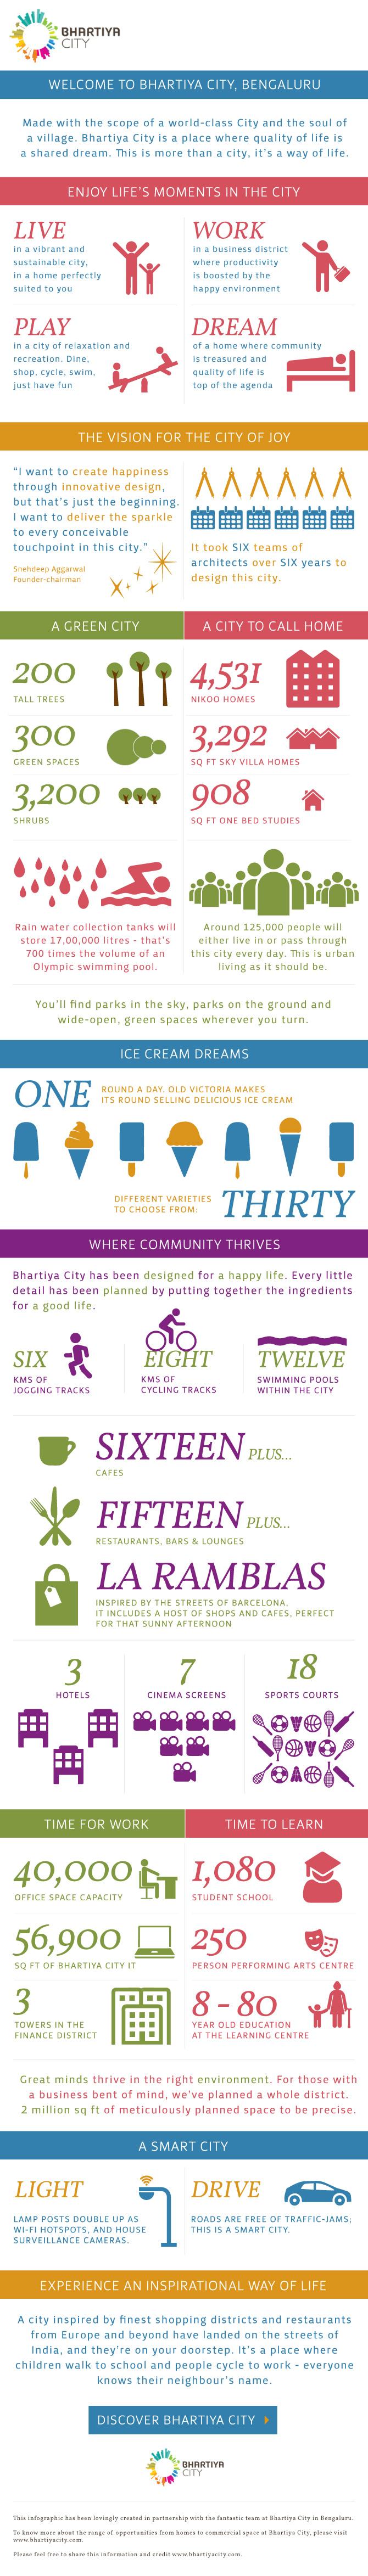 BhartiyaCity-Infographic-v3